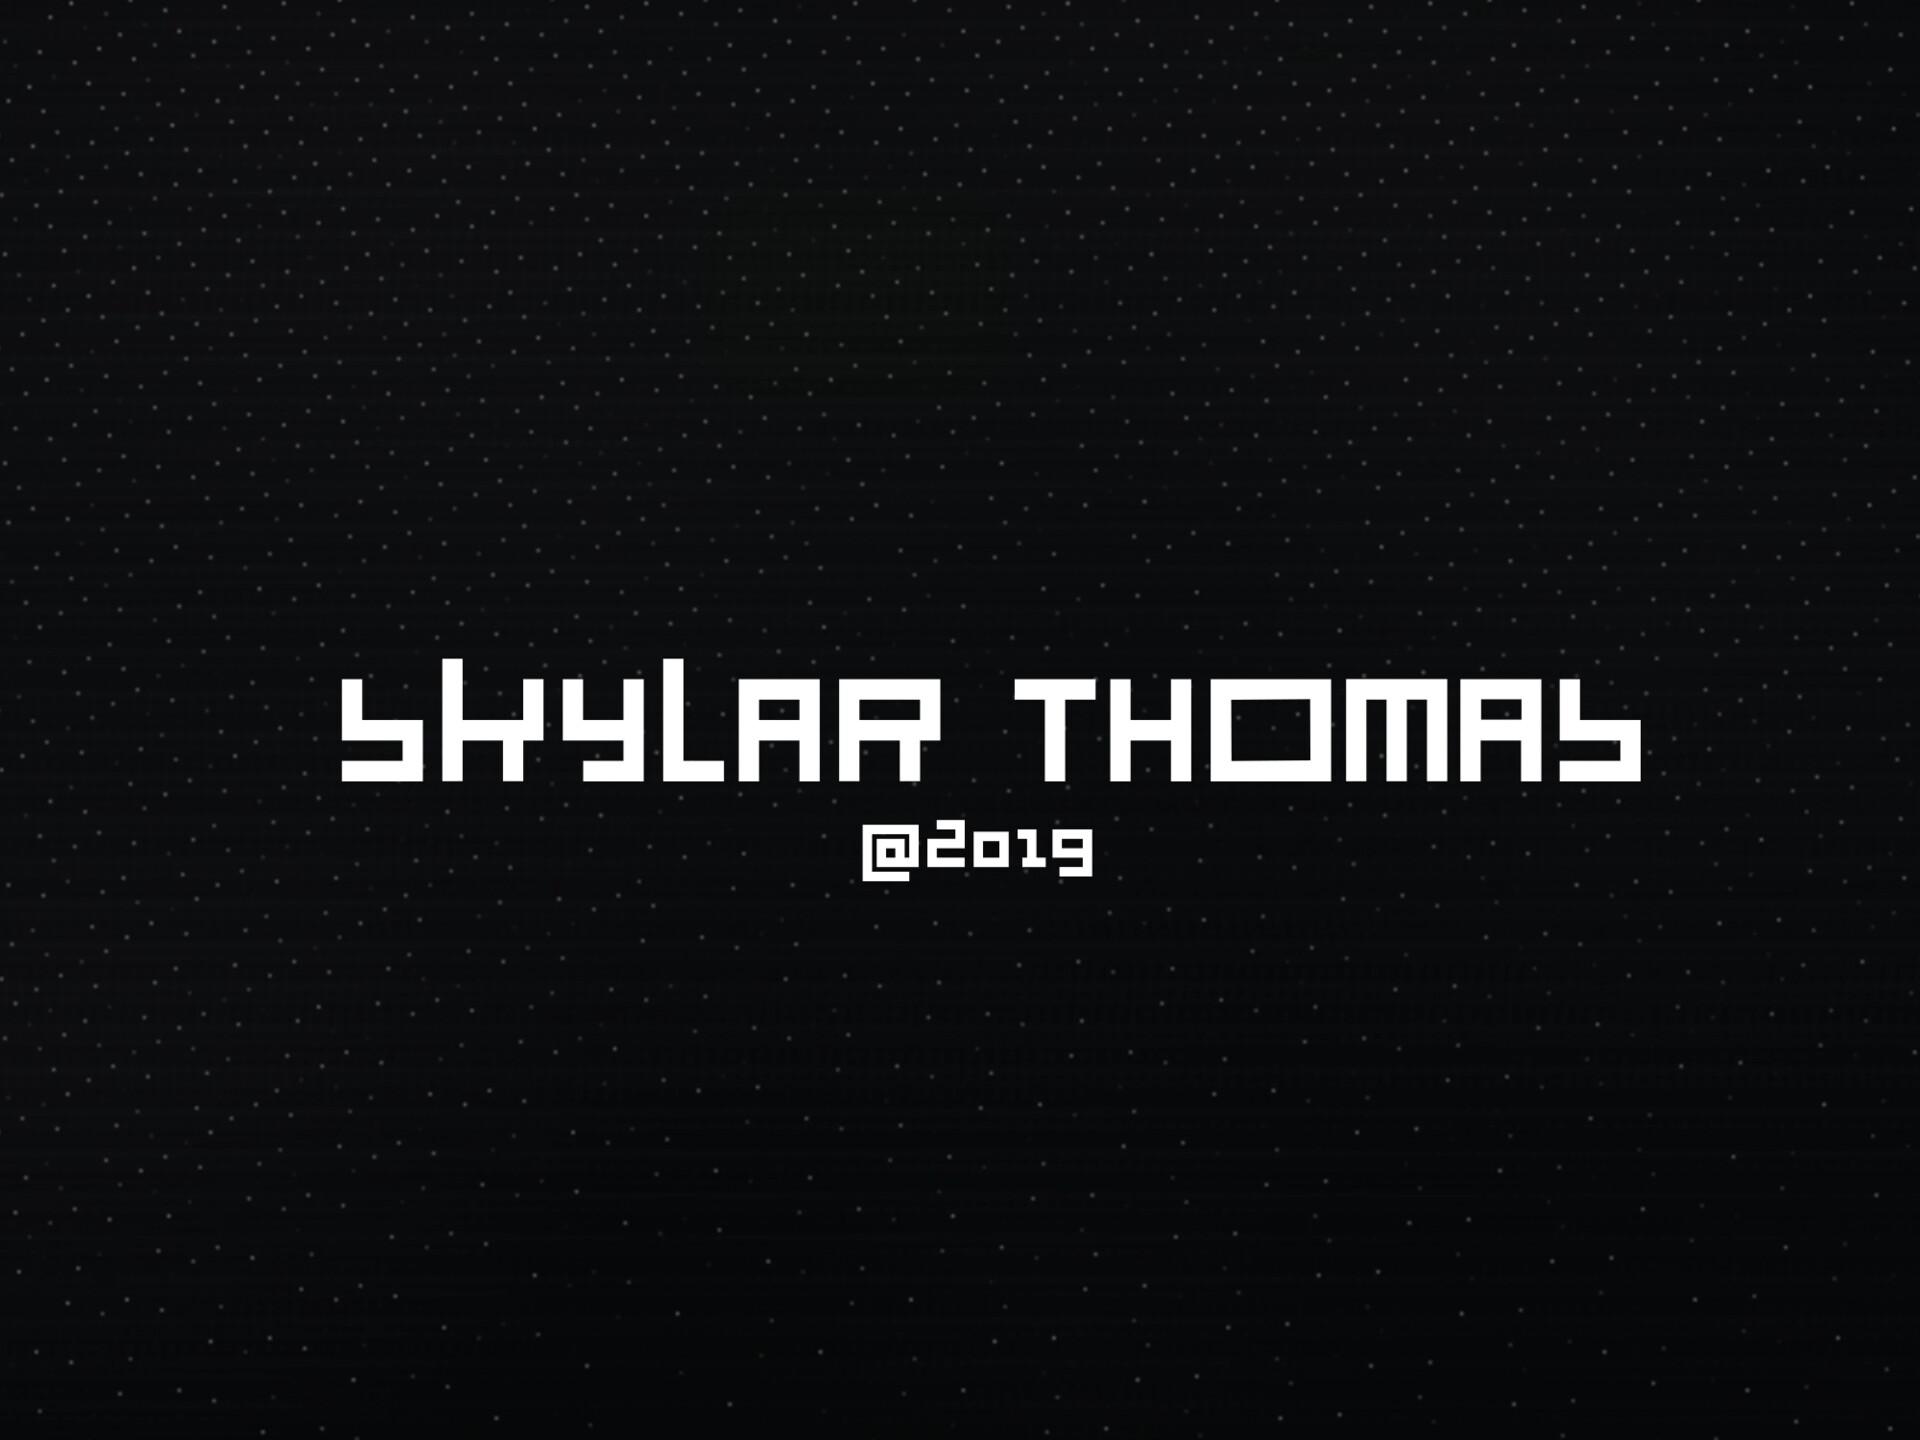 Skylar thomas capsuletemp new 01117